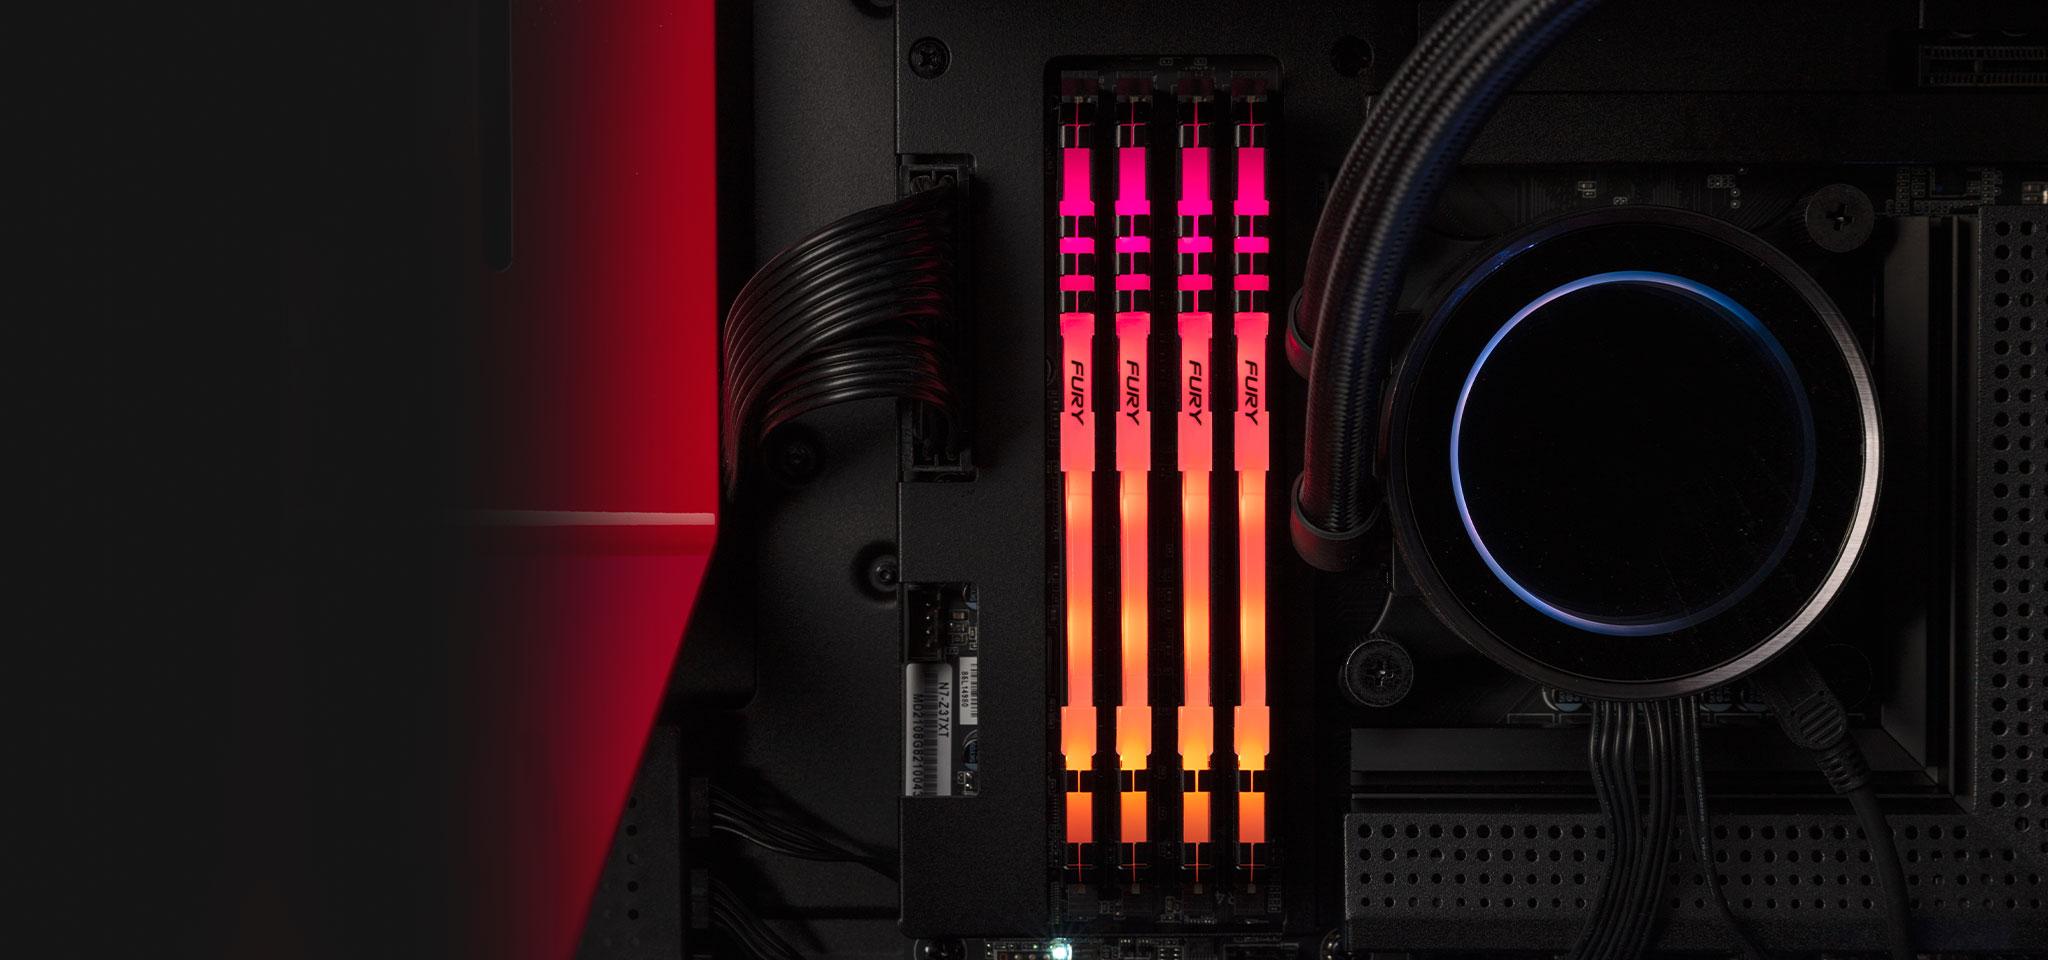 Ram Desktop Kingston Fury RGB